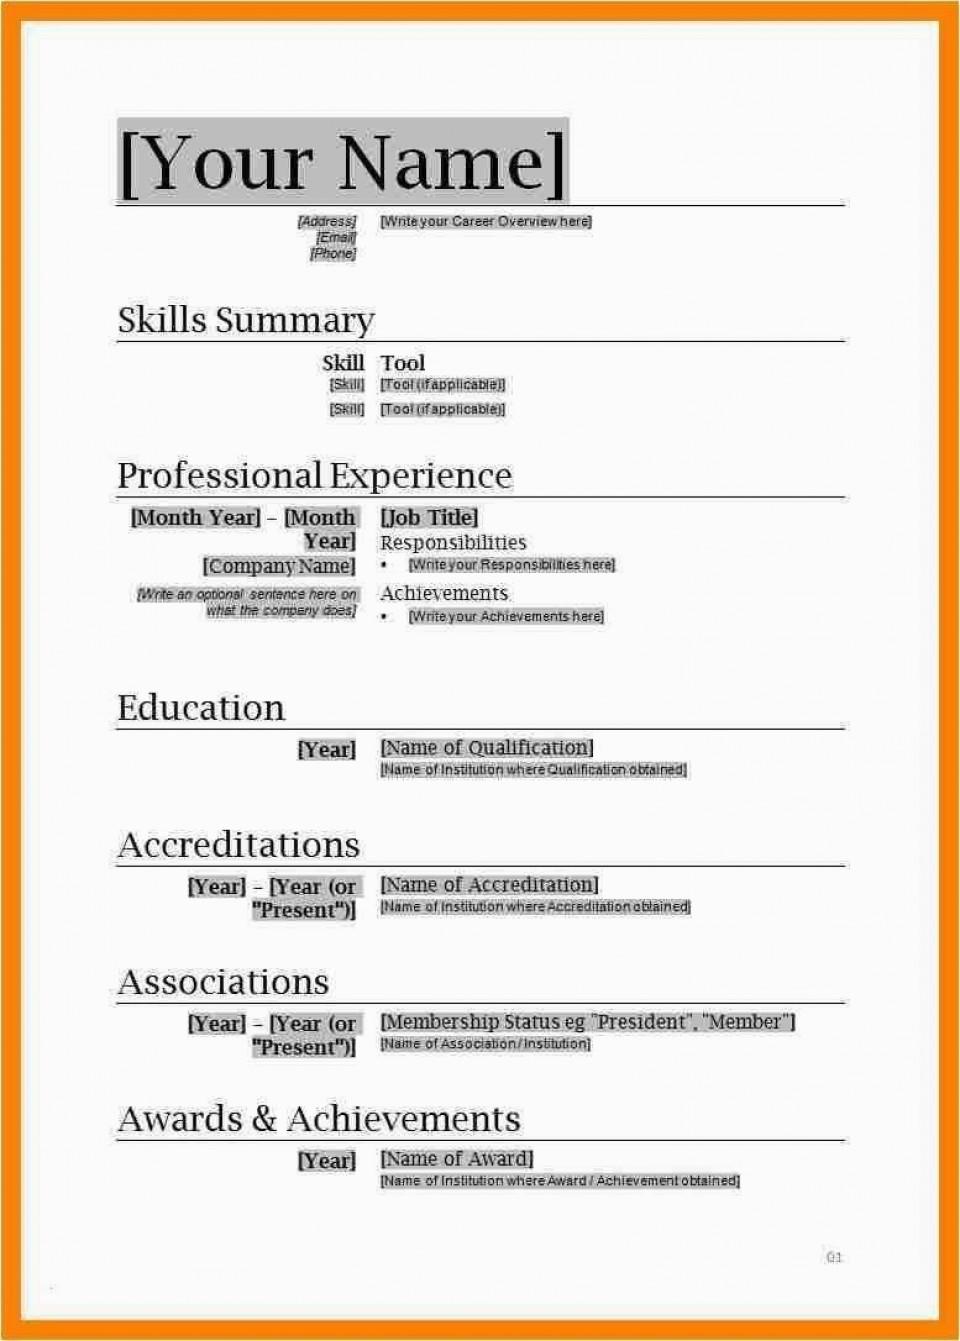 001 Unusual Free Simple Resume Template Microsoft Word Image 960